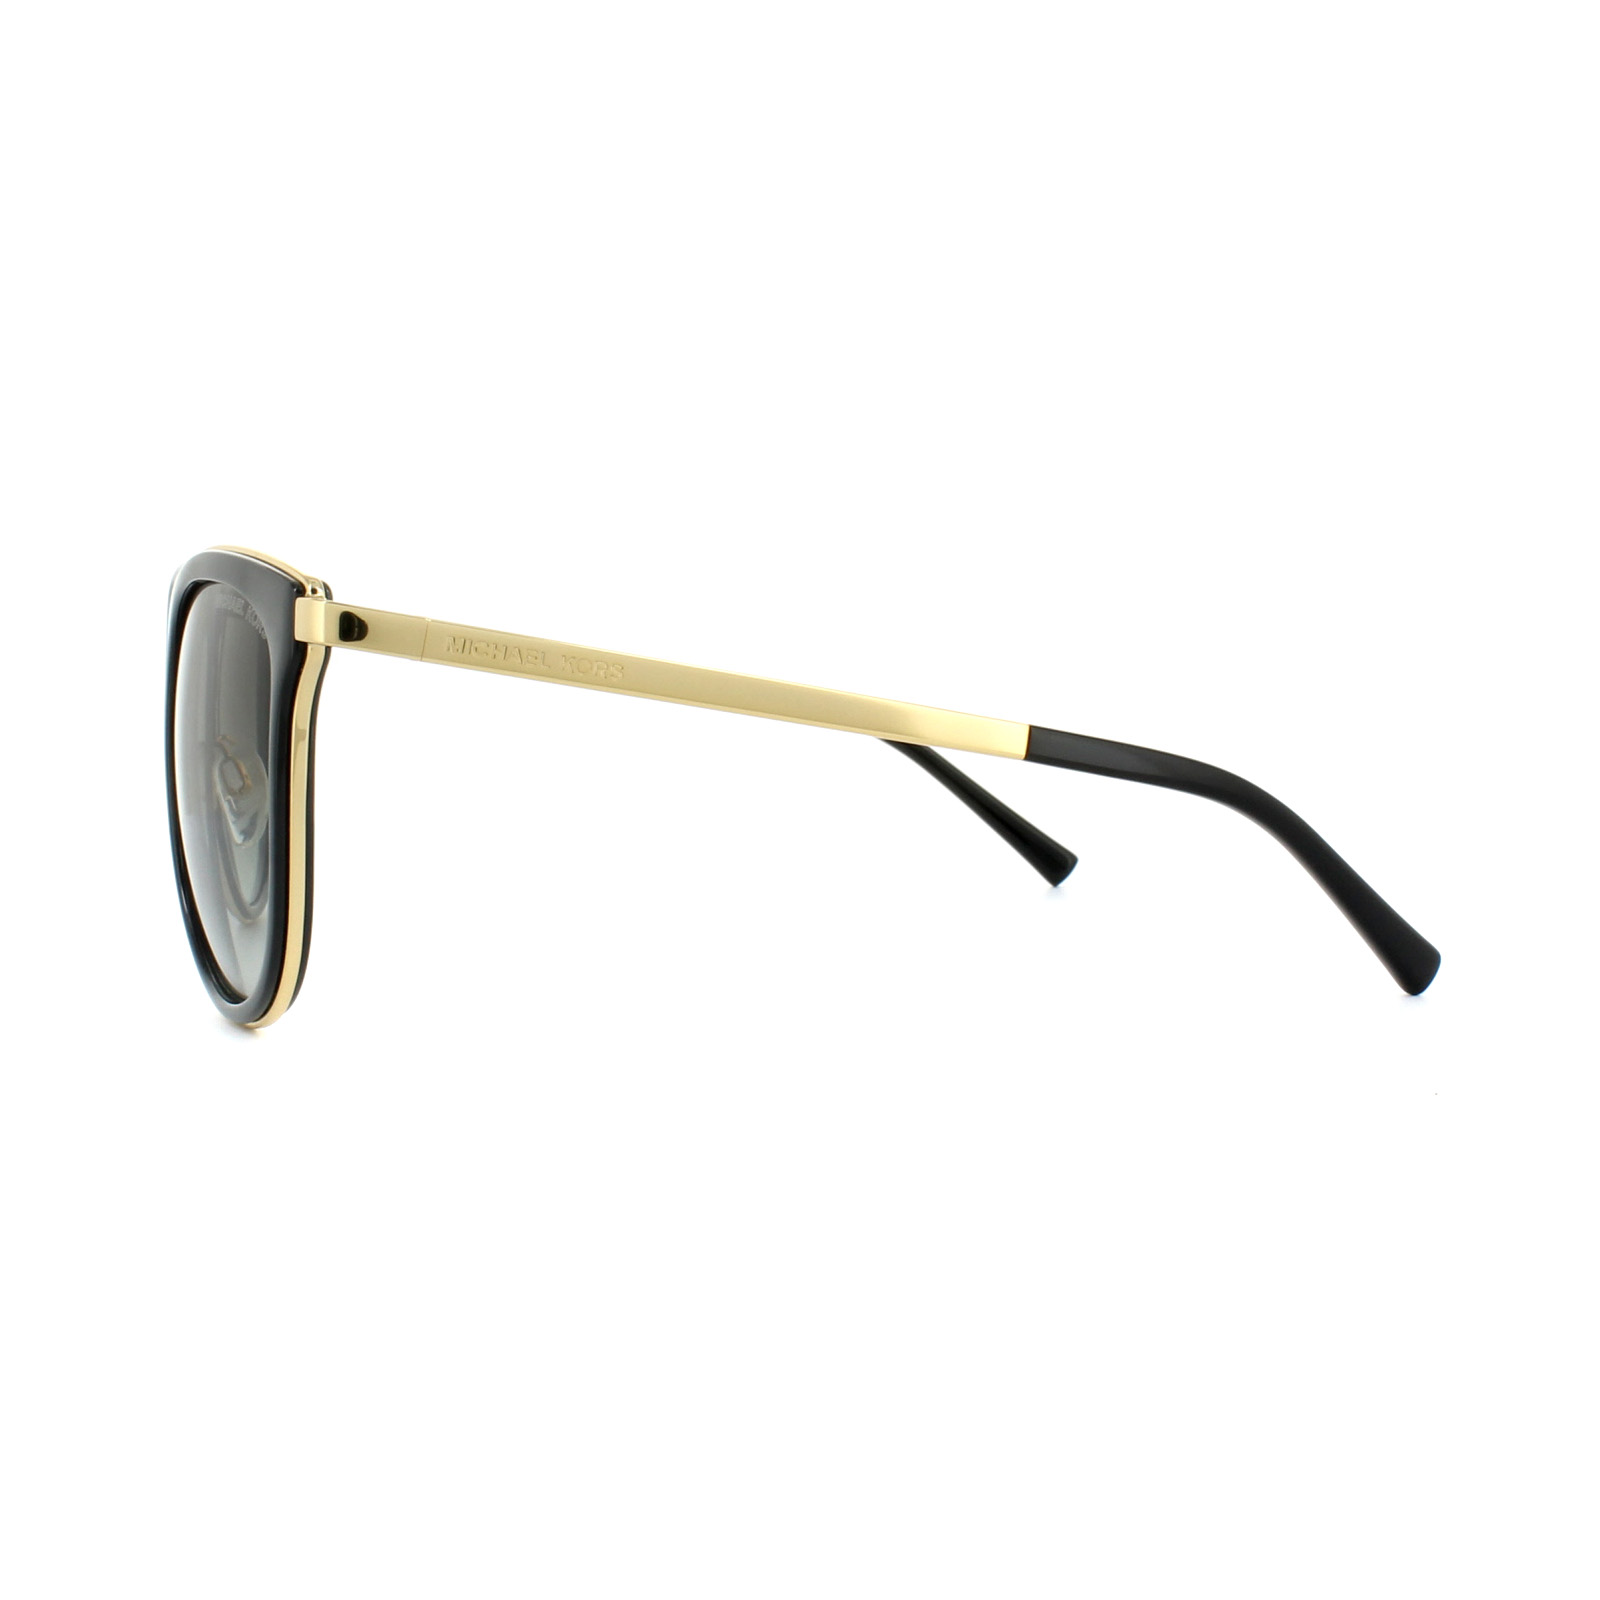 2cdc048636 Sentinel Thumbnail 3. Sentinel Michael Kors Sunglasses Adrianna 1 1010  110011 Black Gold ...